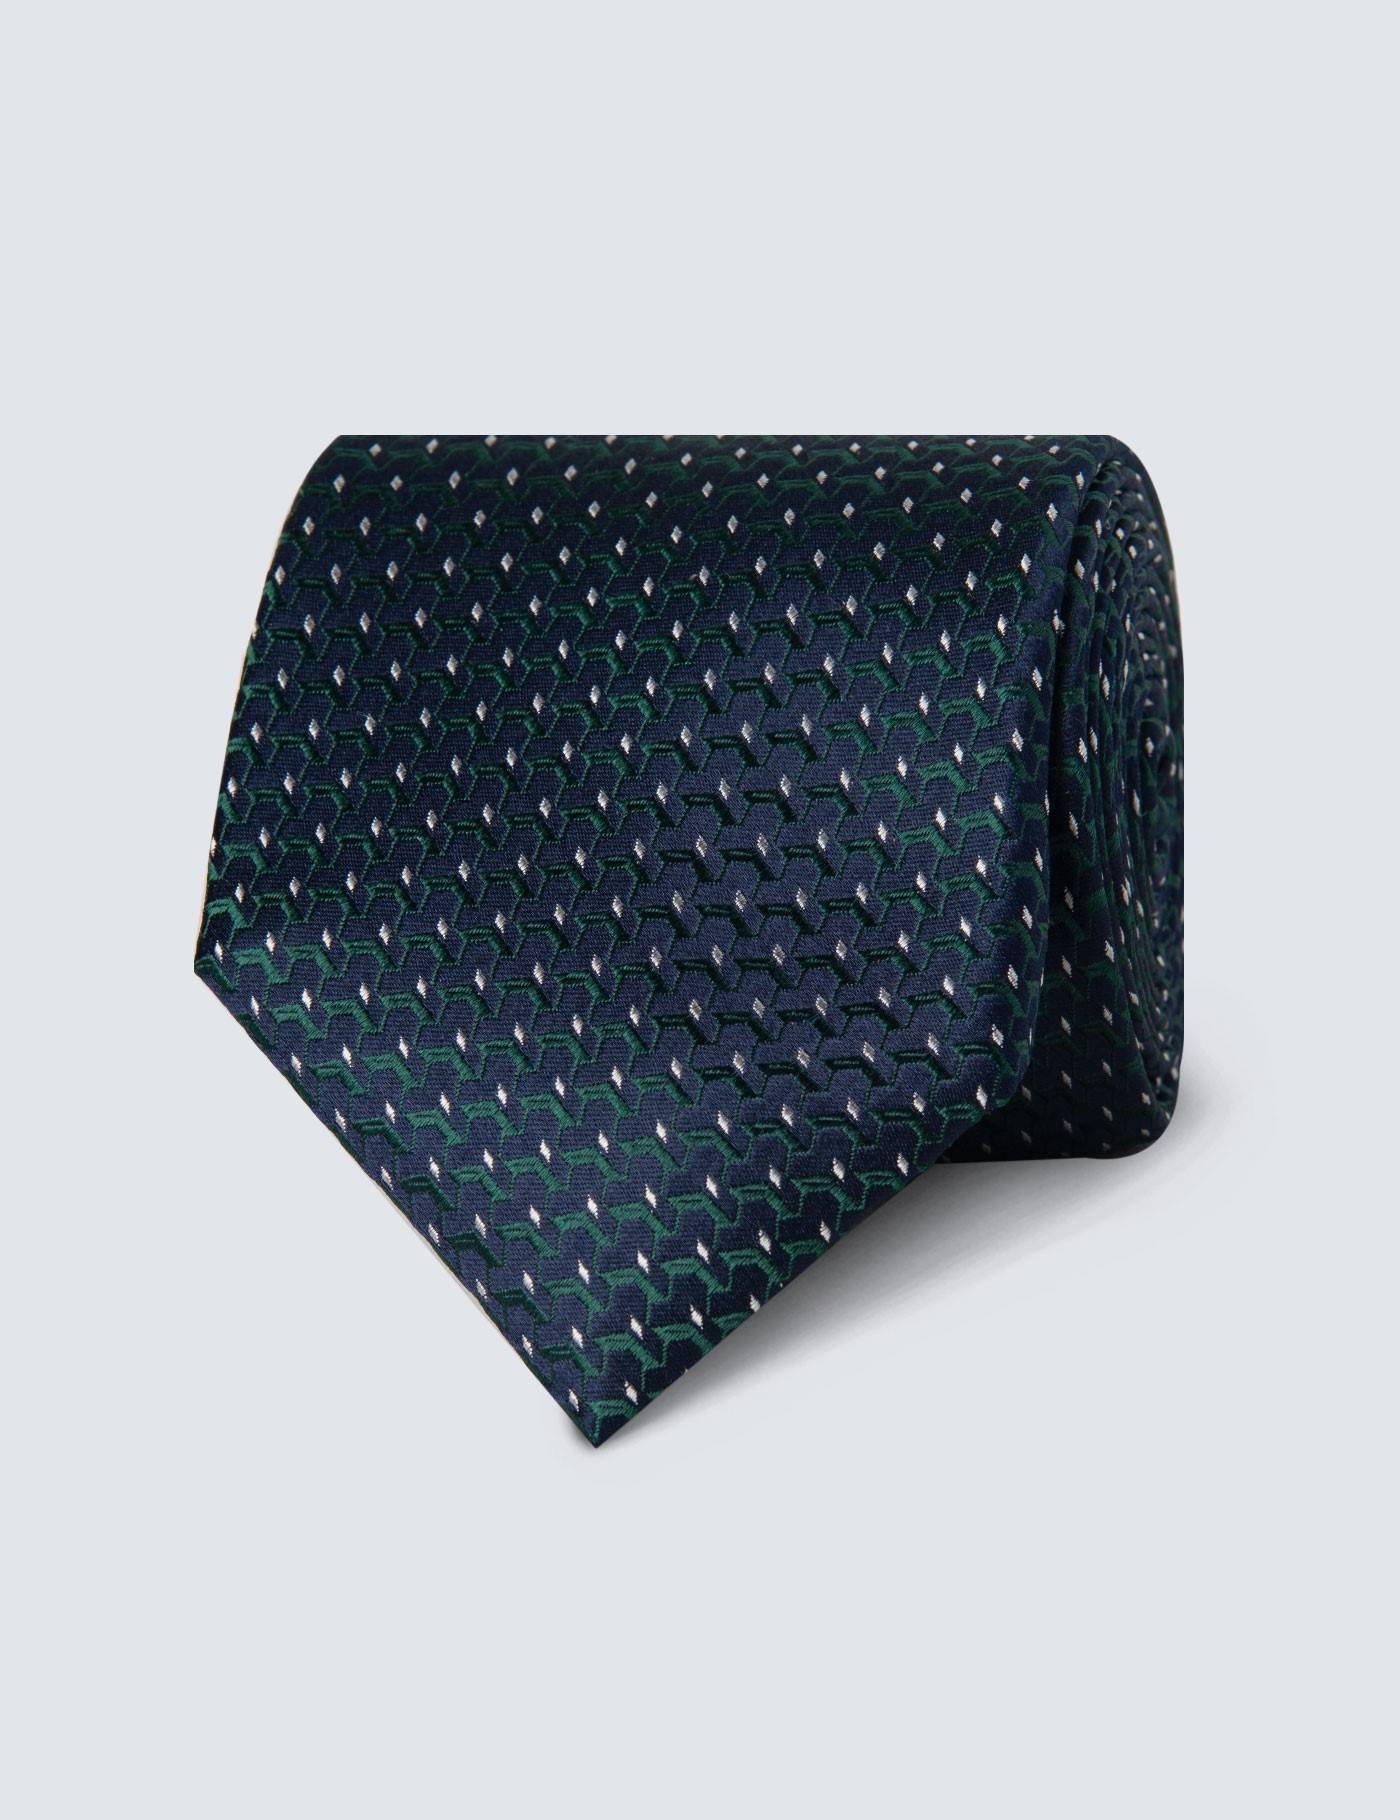 Hawes & Curtis Men's Woven Links Tie in Navy/Green 100% Silk Hawes & Curtis